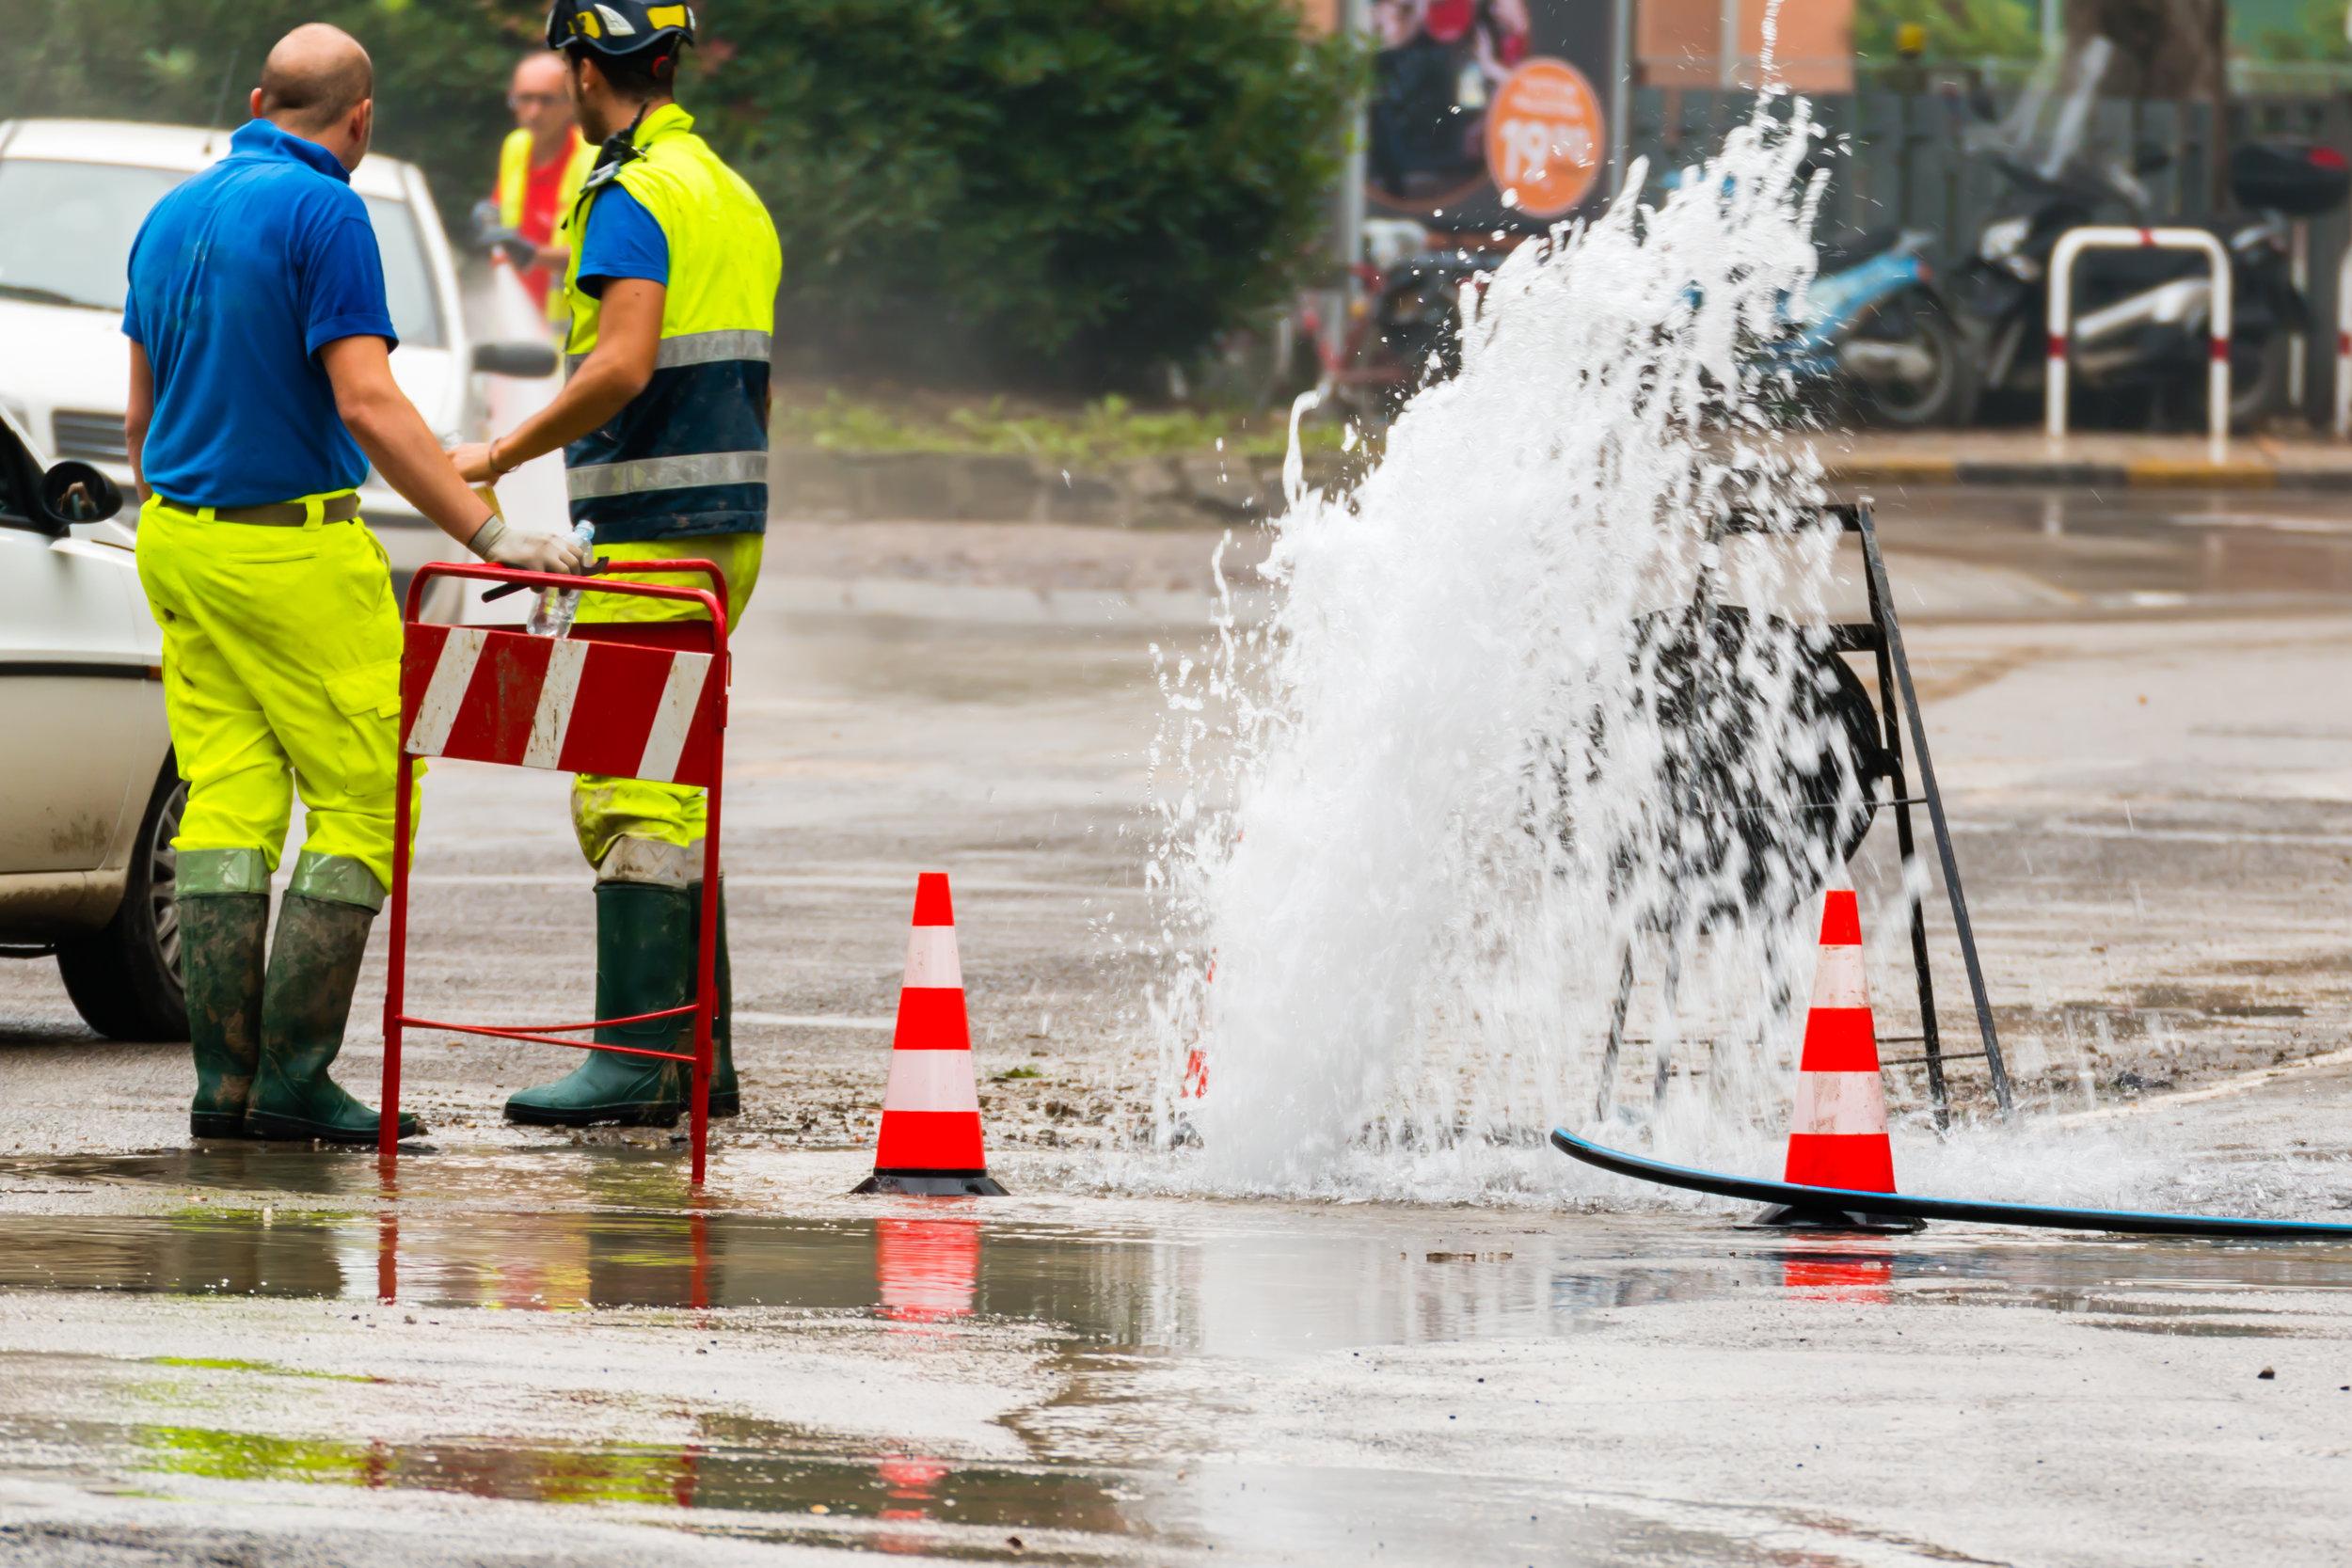 protect_water.jpg